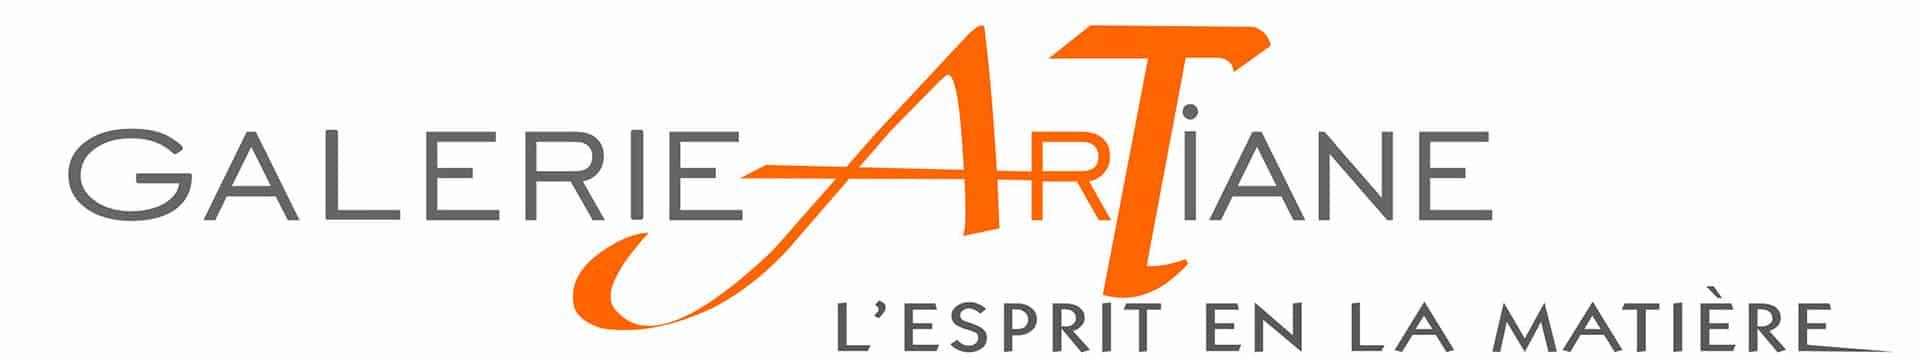 logo galerie artiane honfleur